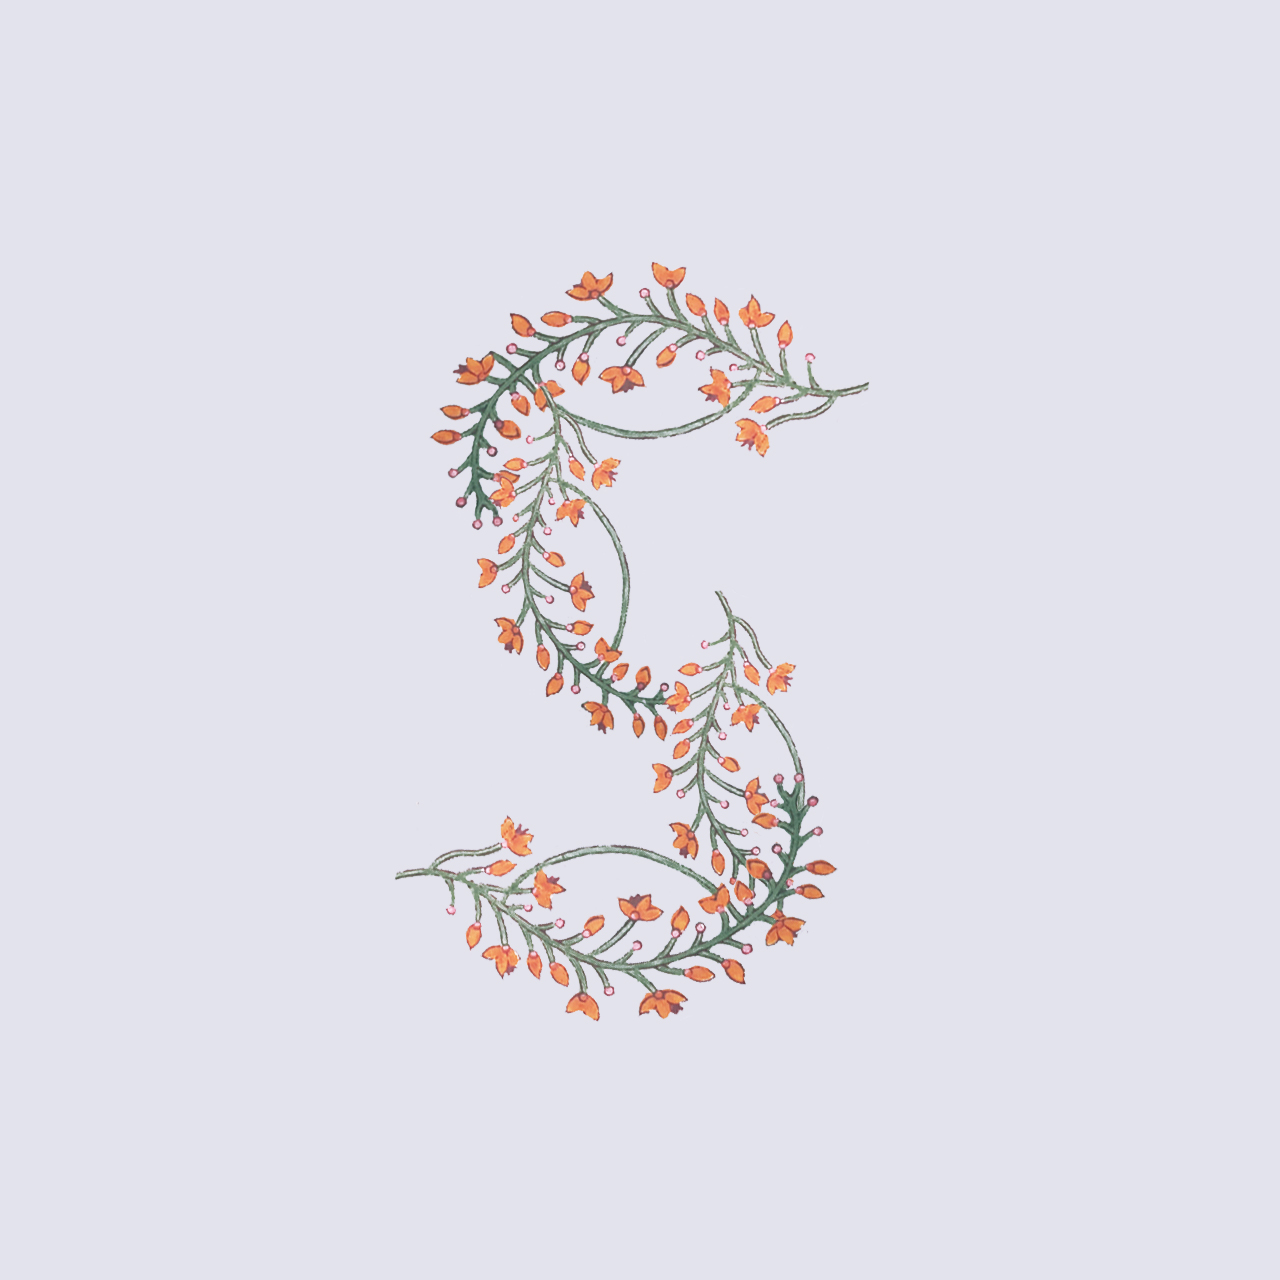 36days_s.jpg